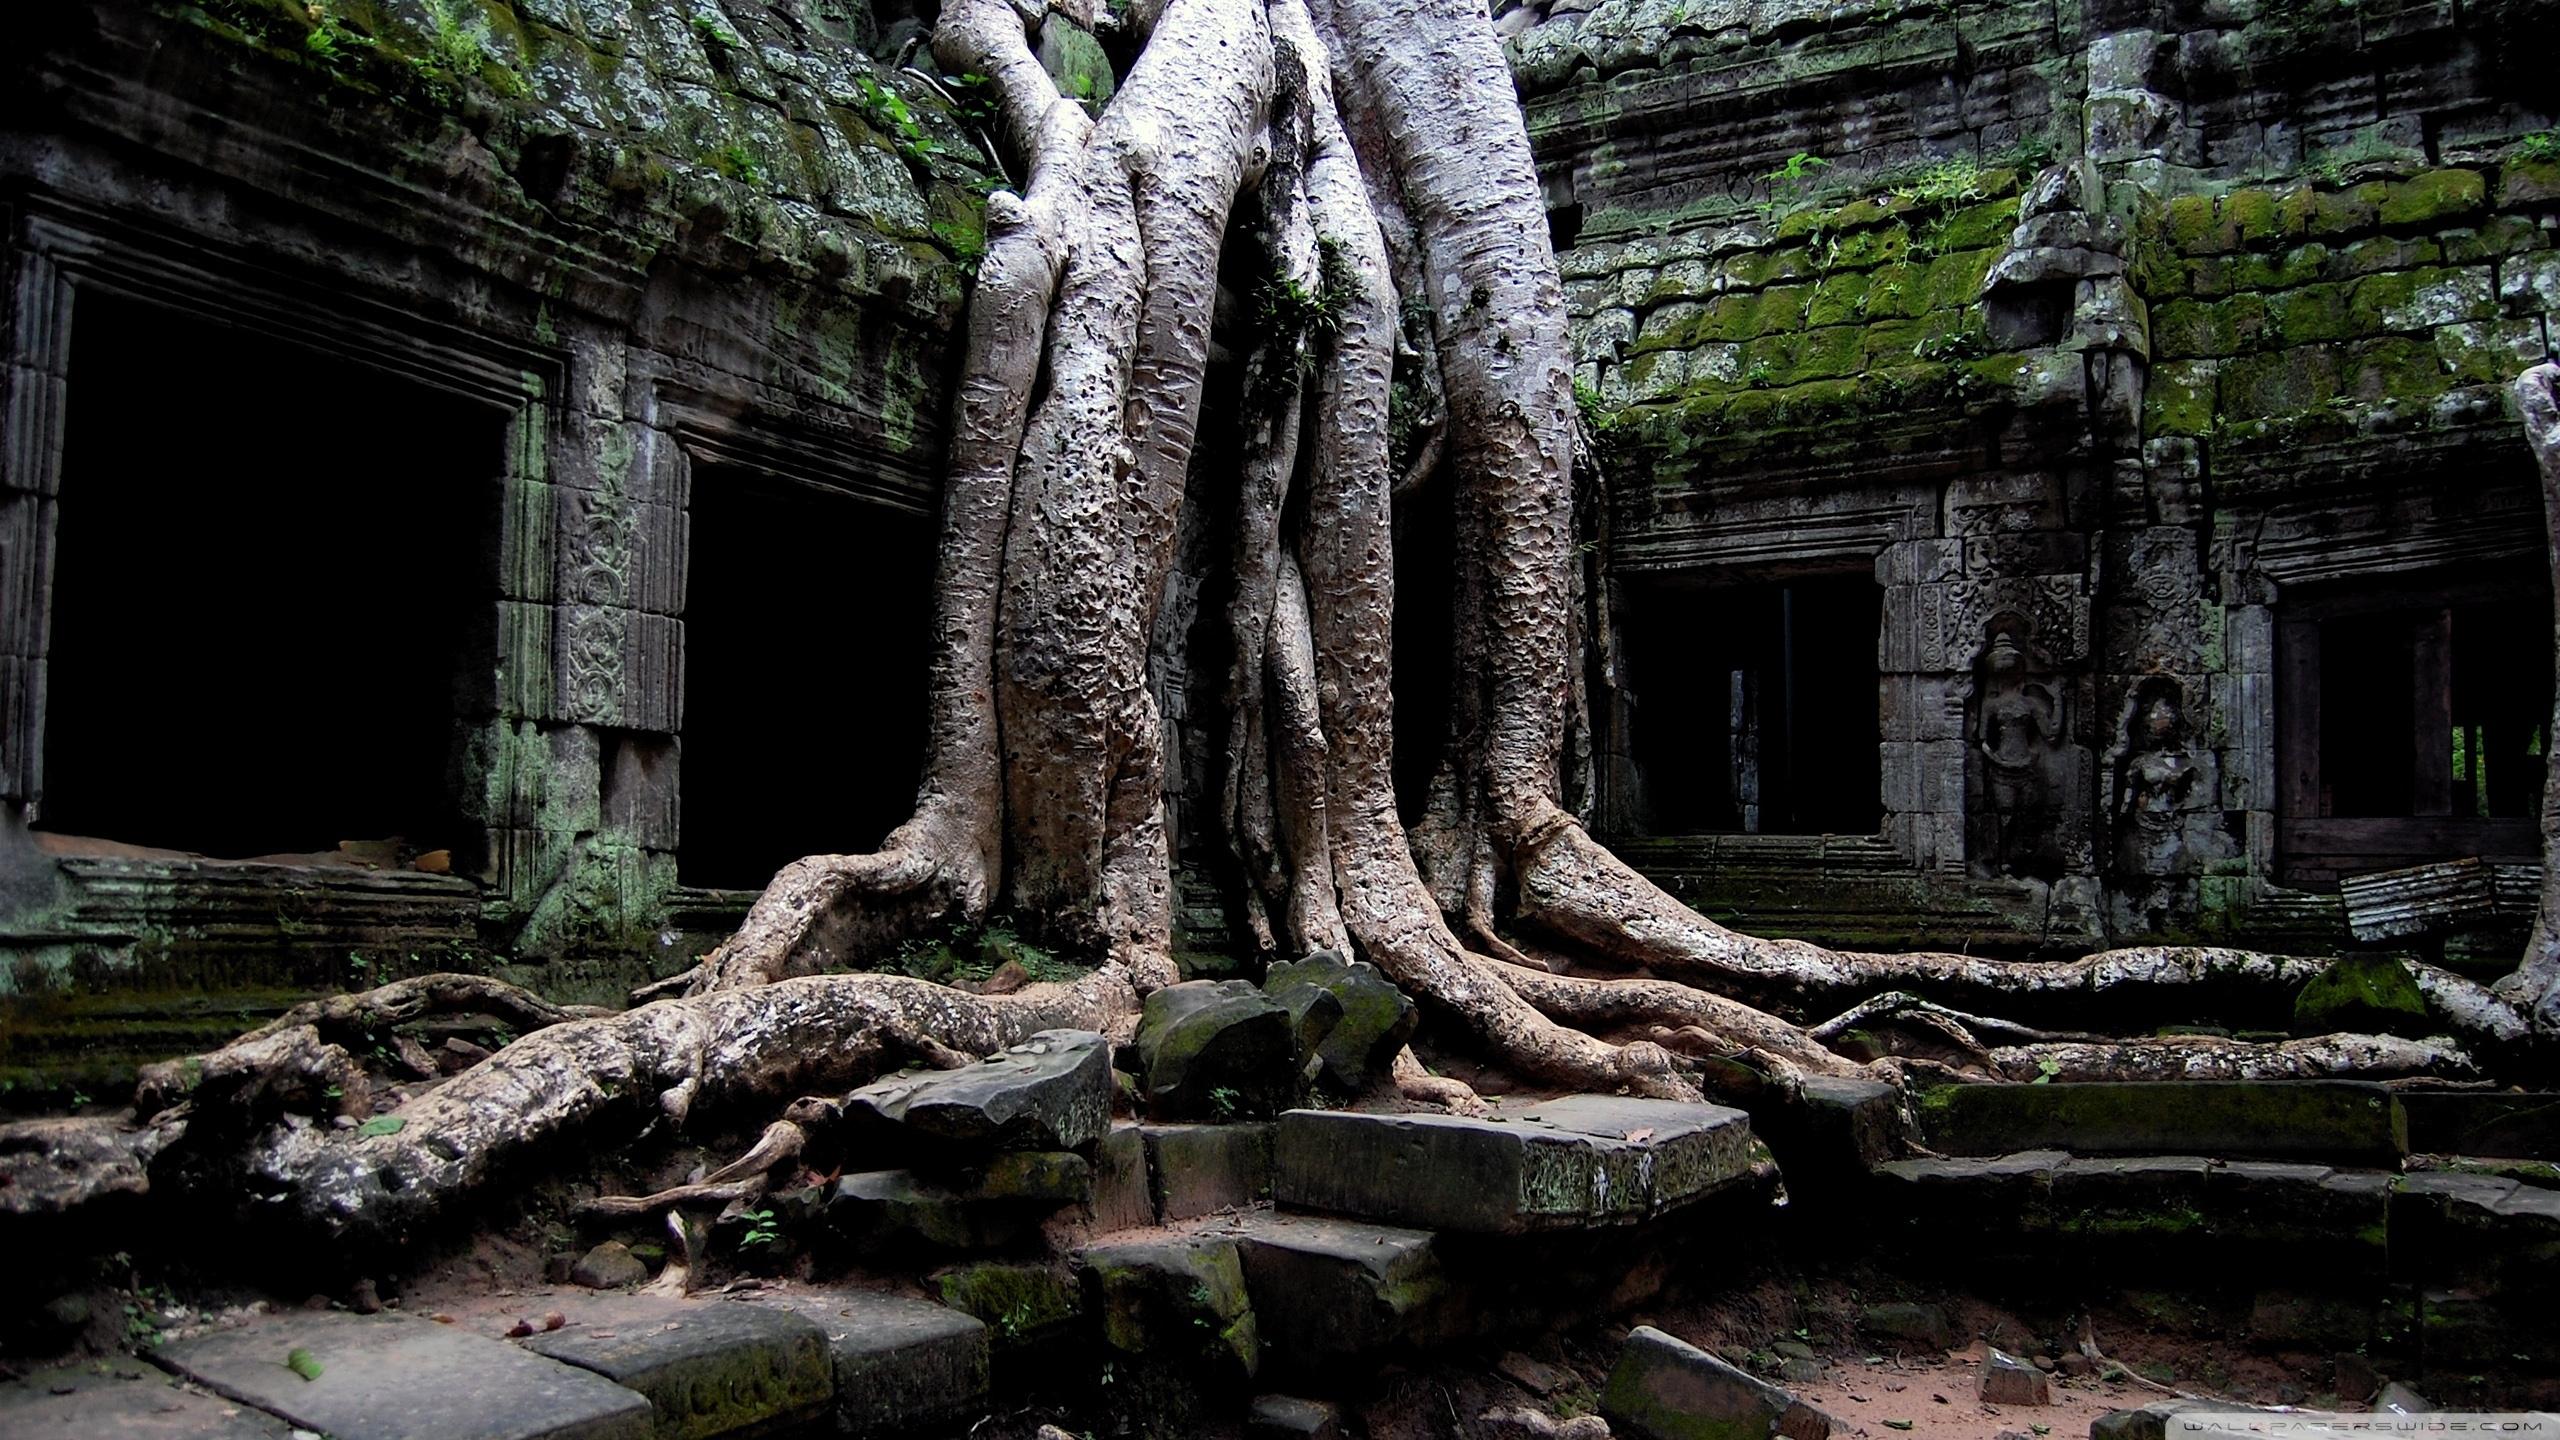 angkor wat temple, cambodia ❤ 4k hd desktop wallpaper for 4k ultra